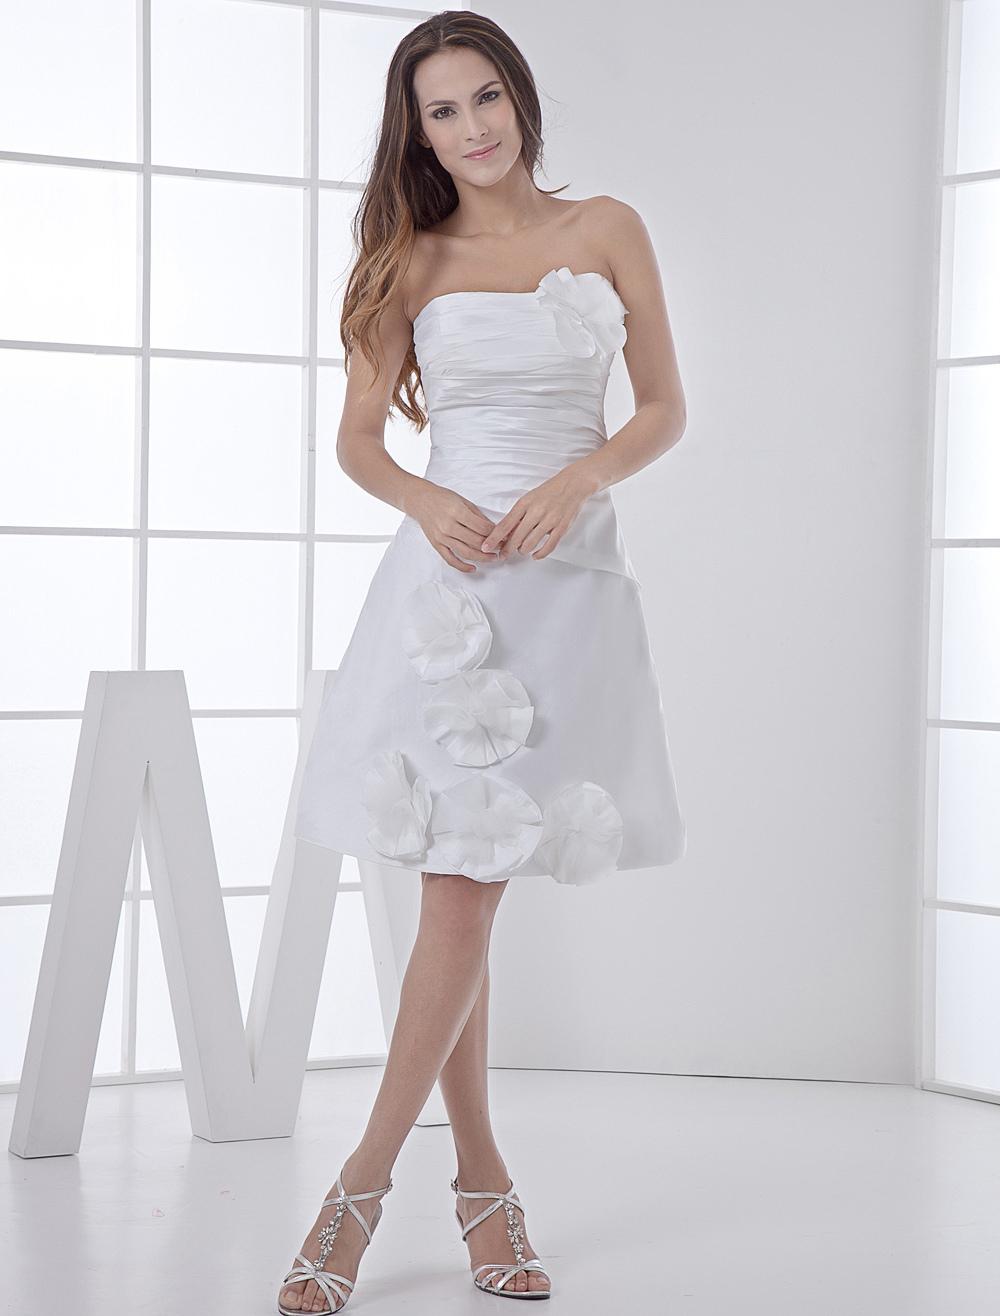 white wedding dress knee length strapless flowers ruched taffeta wedding gown p mini wedding dress White Wedding Dress Knee Length Strapless Flowers Ruched Taffeta Wedding Gown Milanoo com